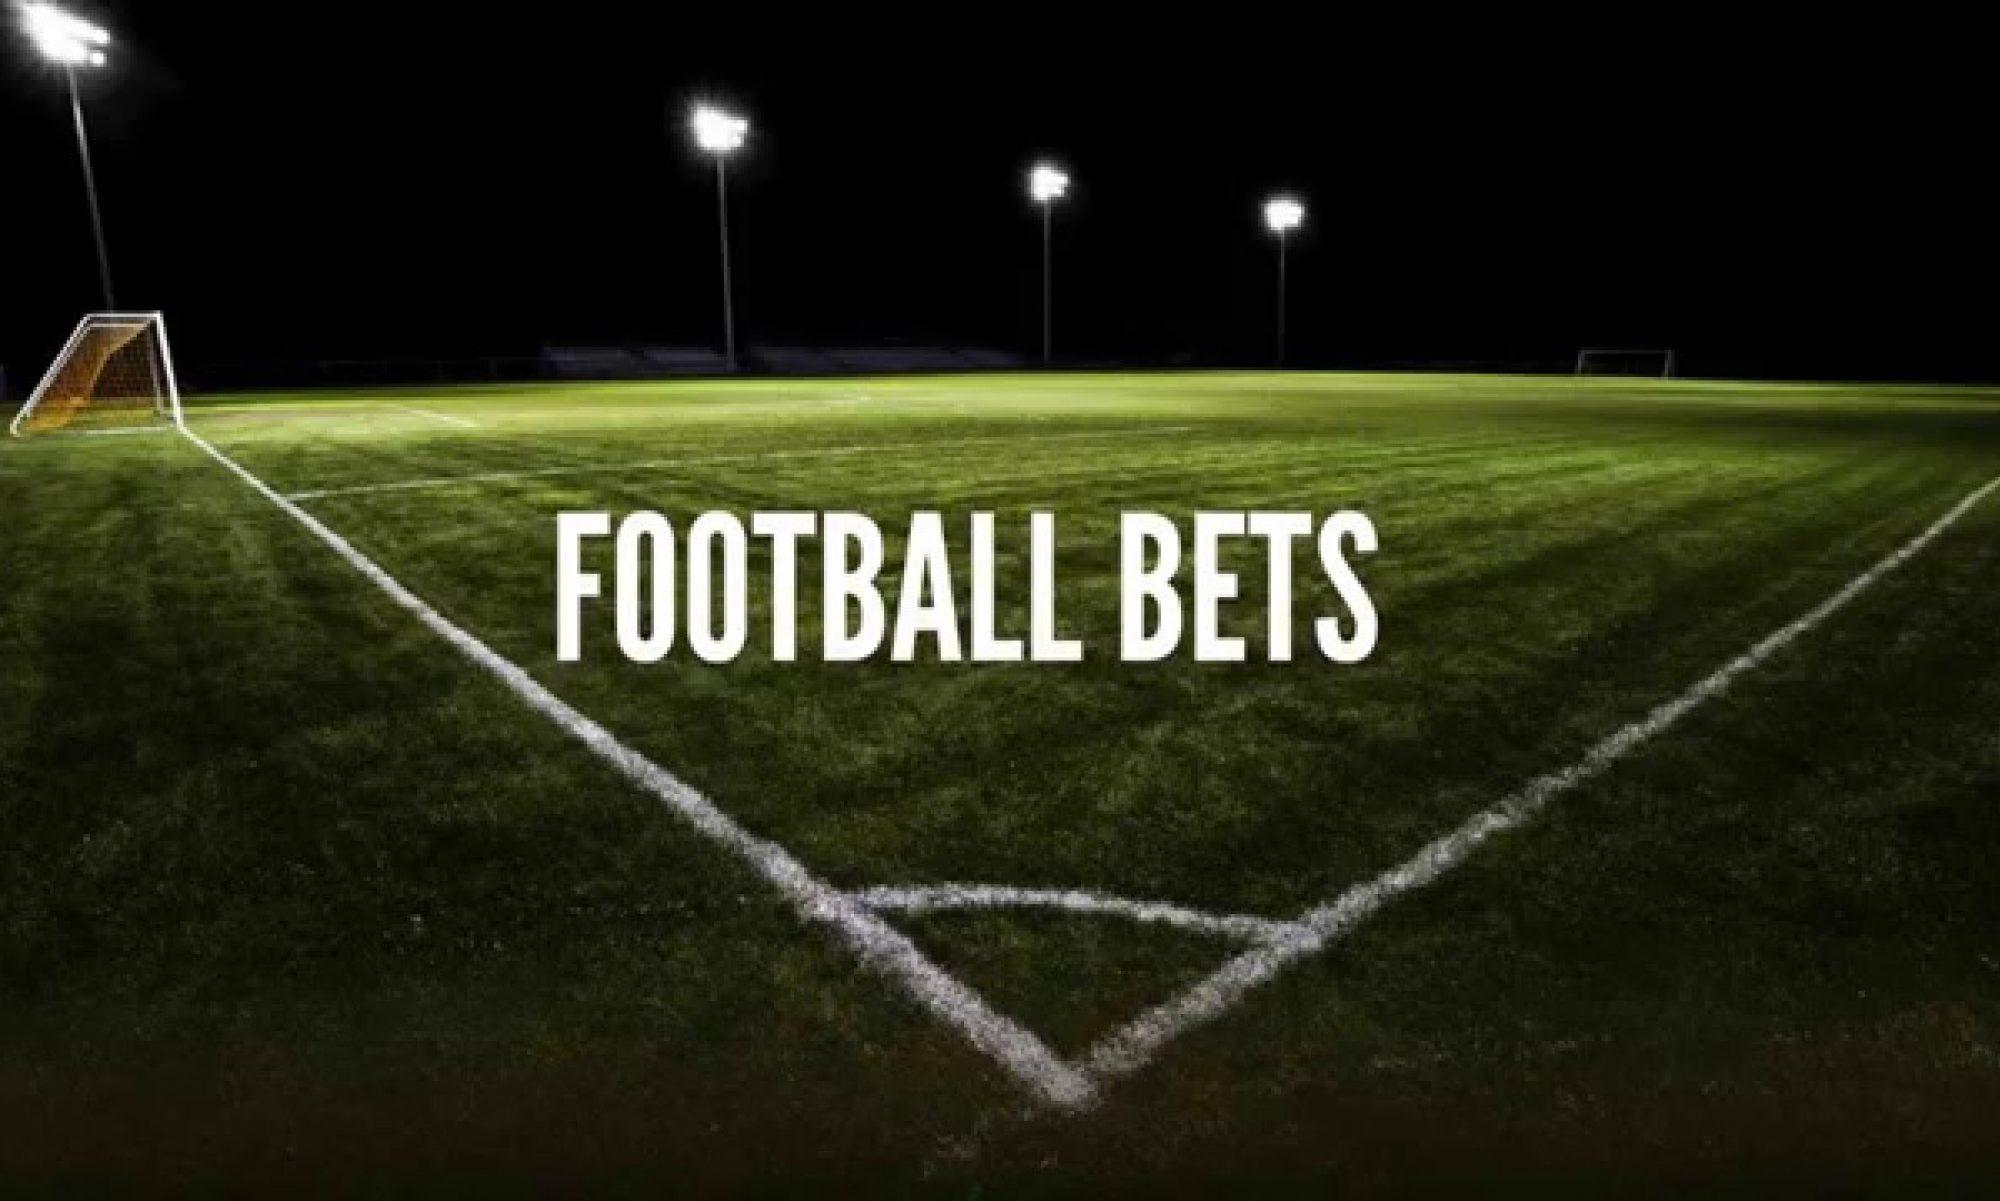 AfricanFootballBets